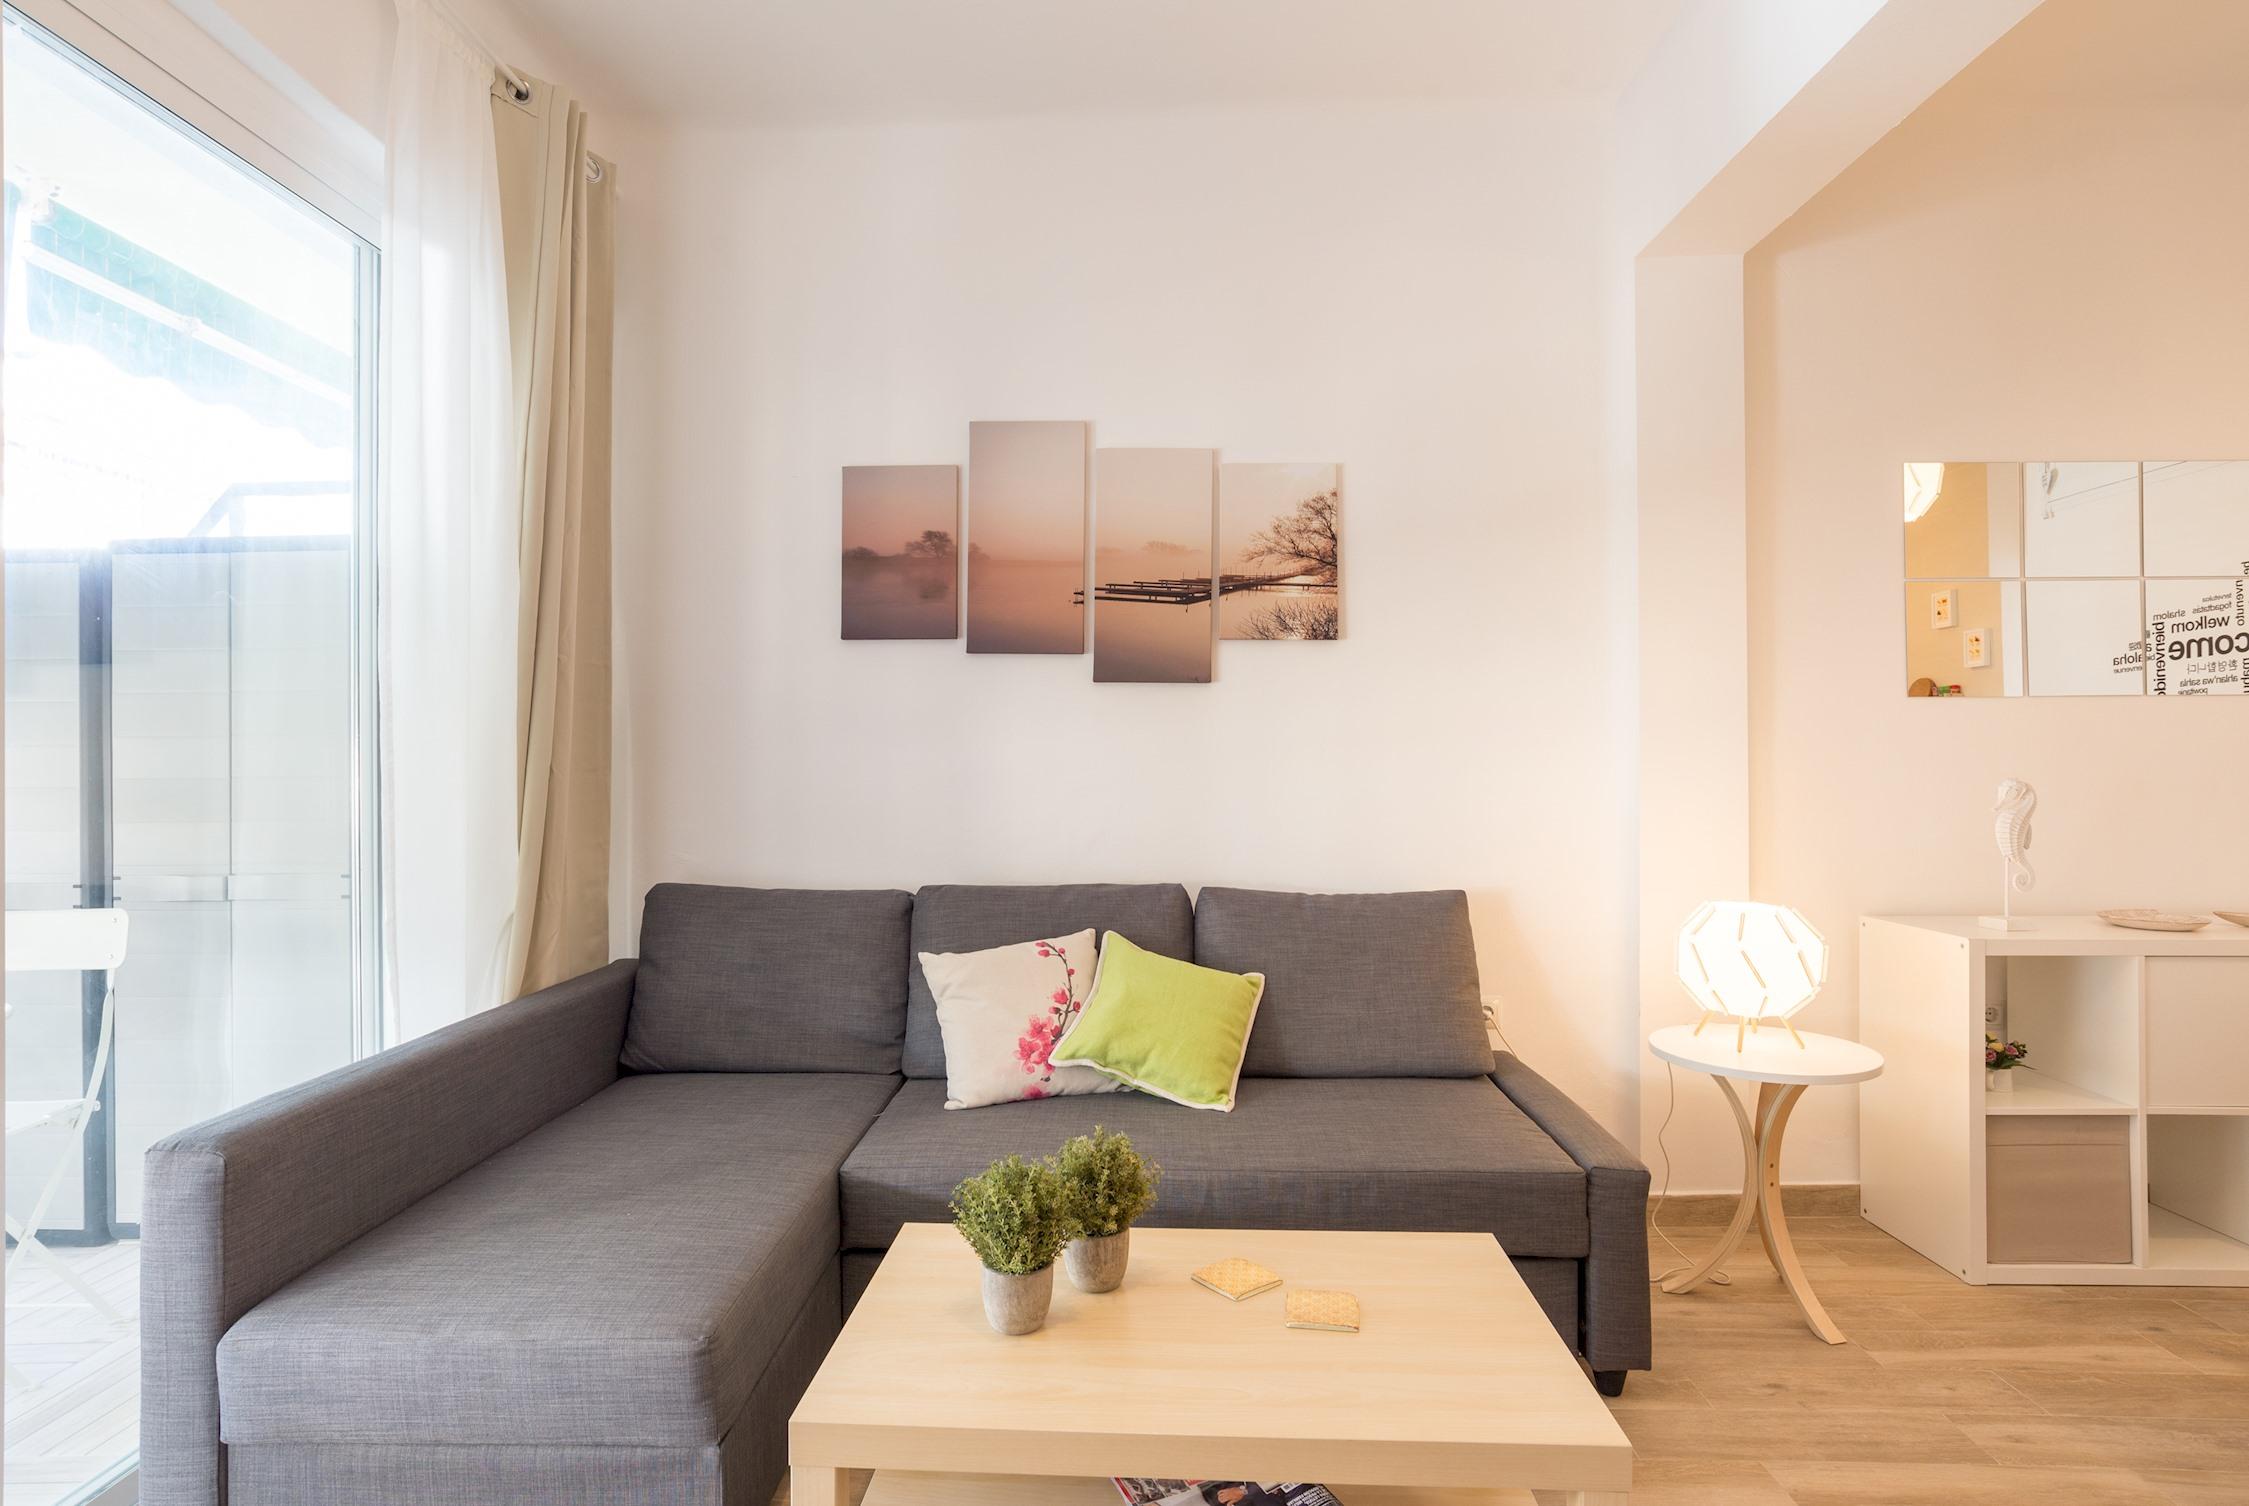 Apartment MalagaSuite Front Beach Fuengirola photo 18362148